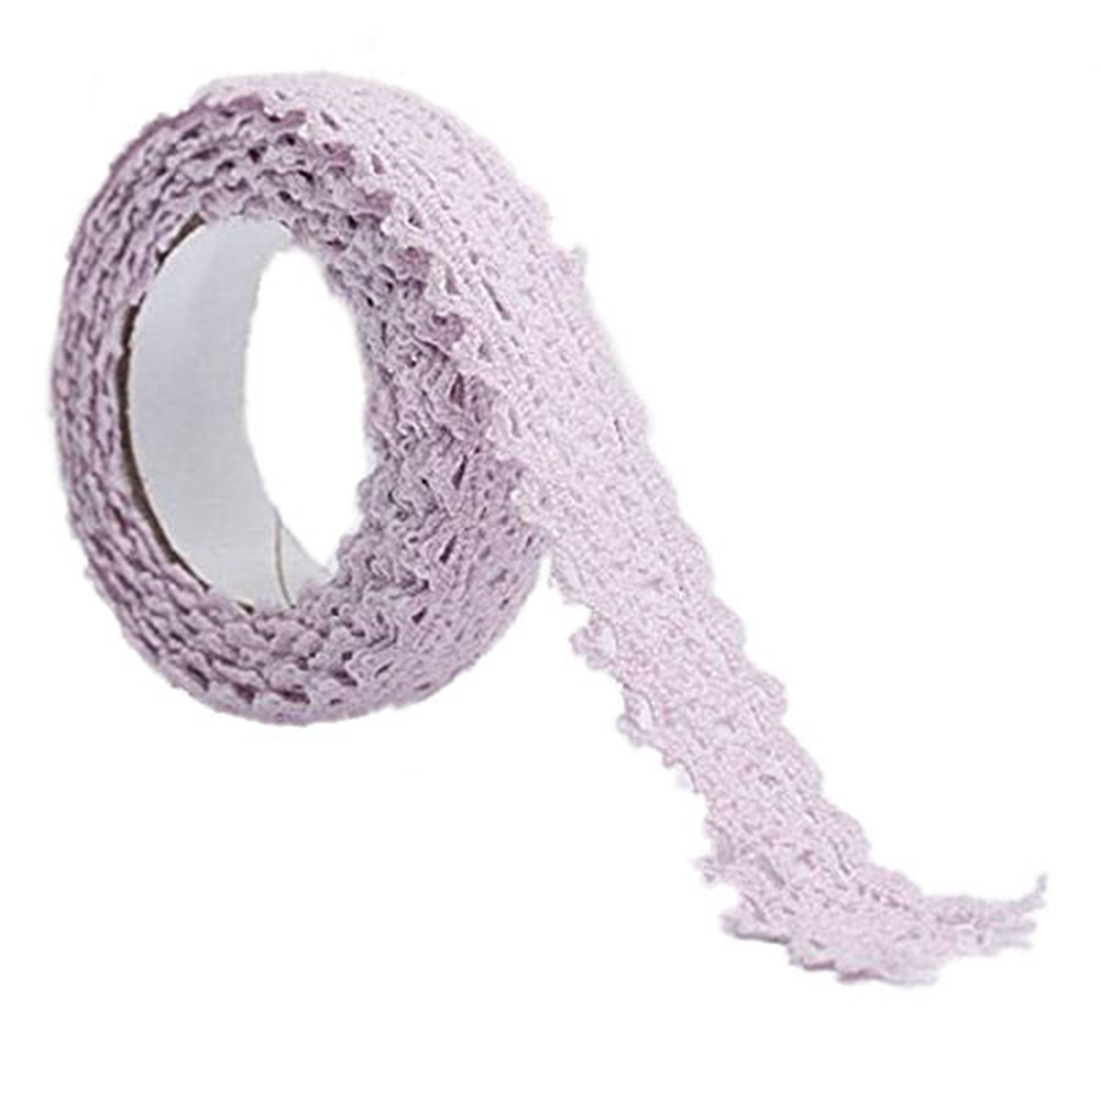 1x Decoration Band Christmas Ribbon Lace Wedding Gift on 1.8 * 170cm Light purple